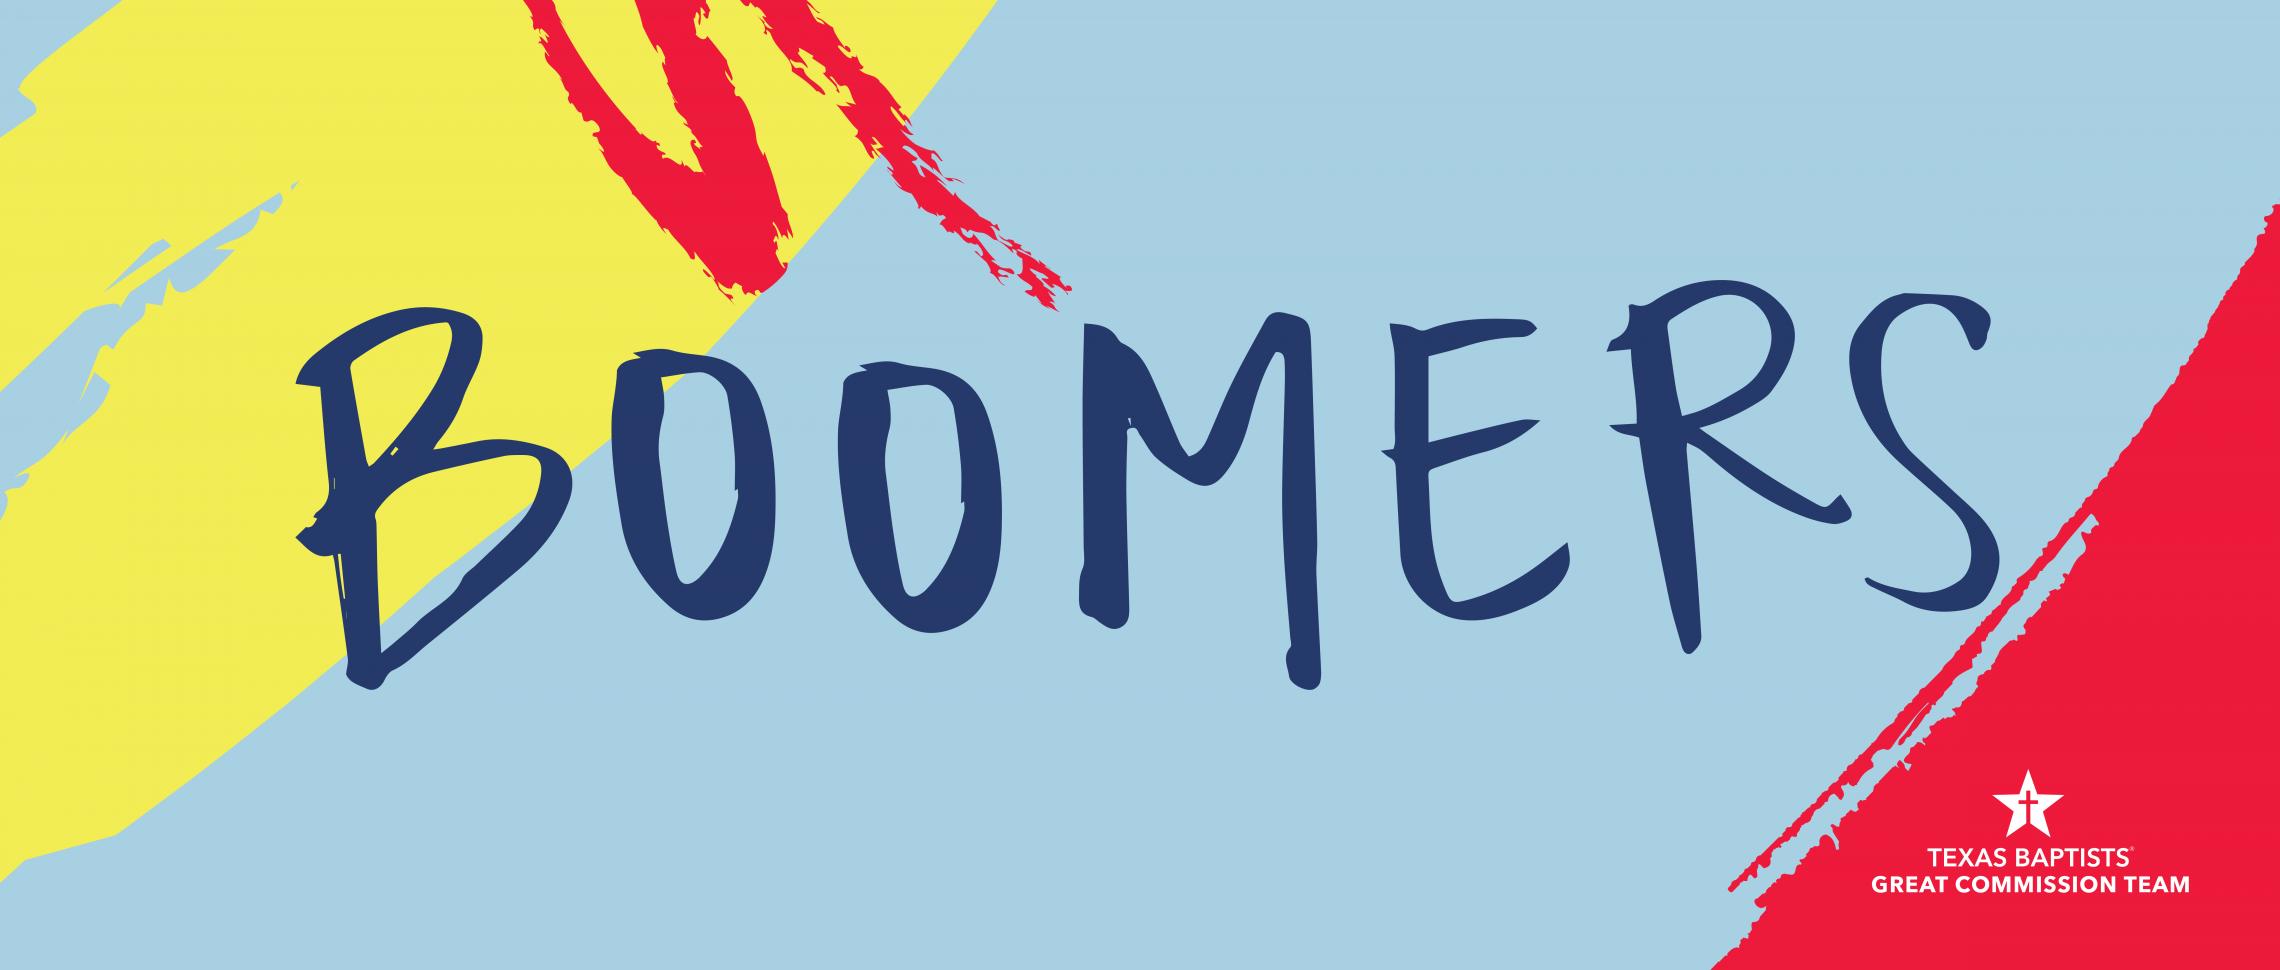 boomers - photo #41